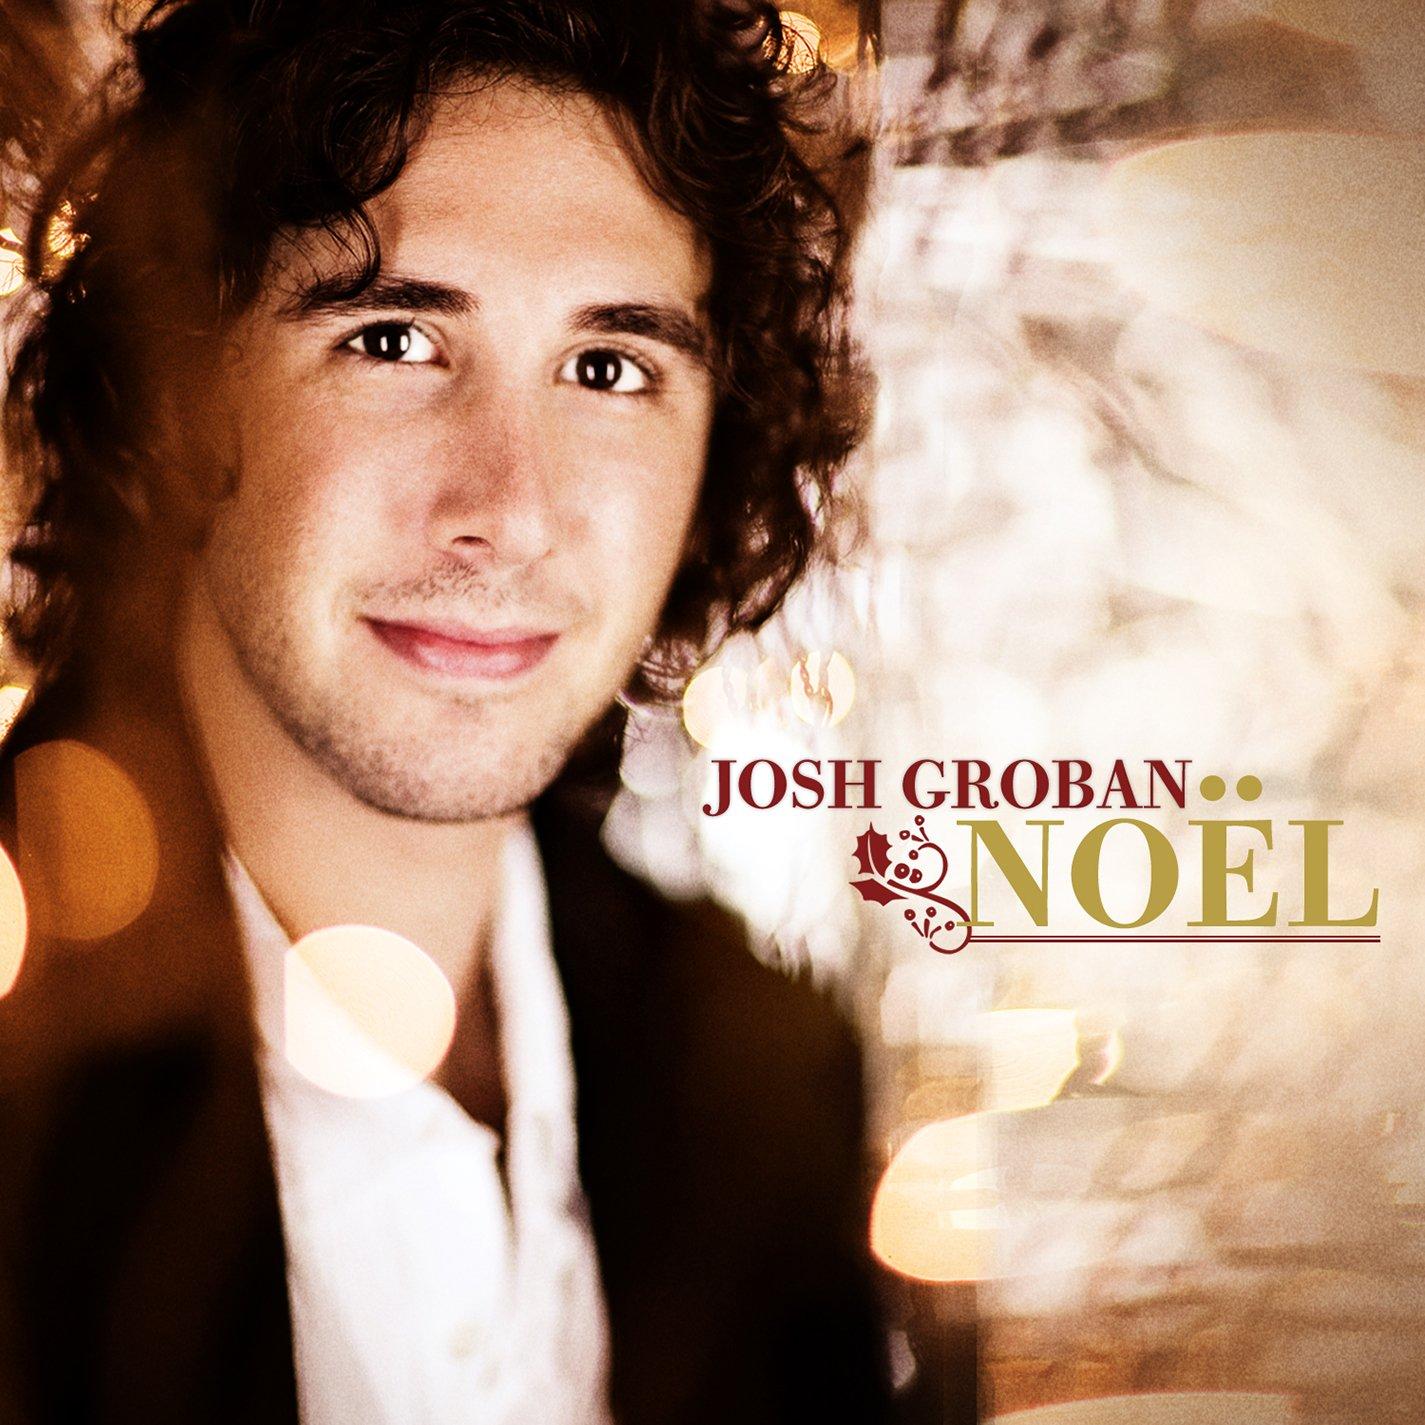 Josh Groban - Noel (2LP) - Amazon.com Music